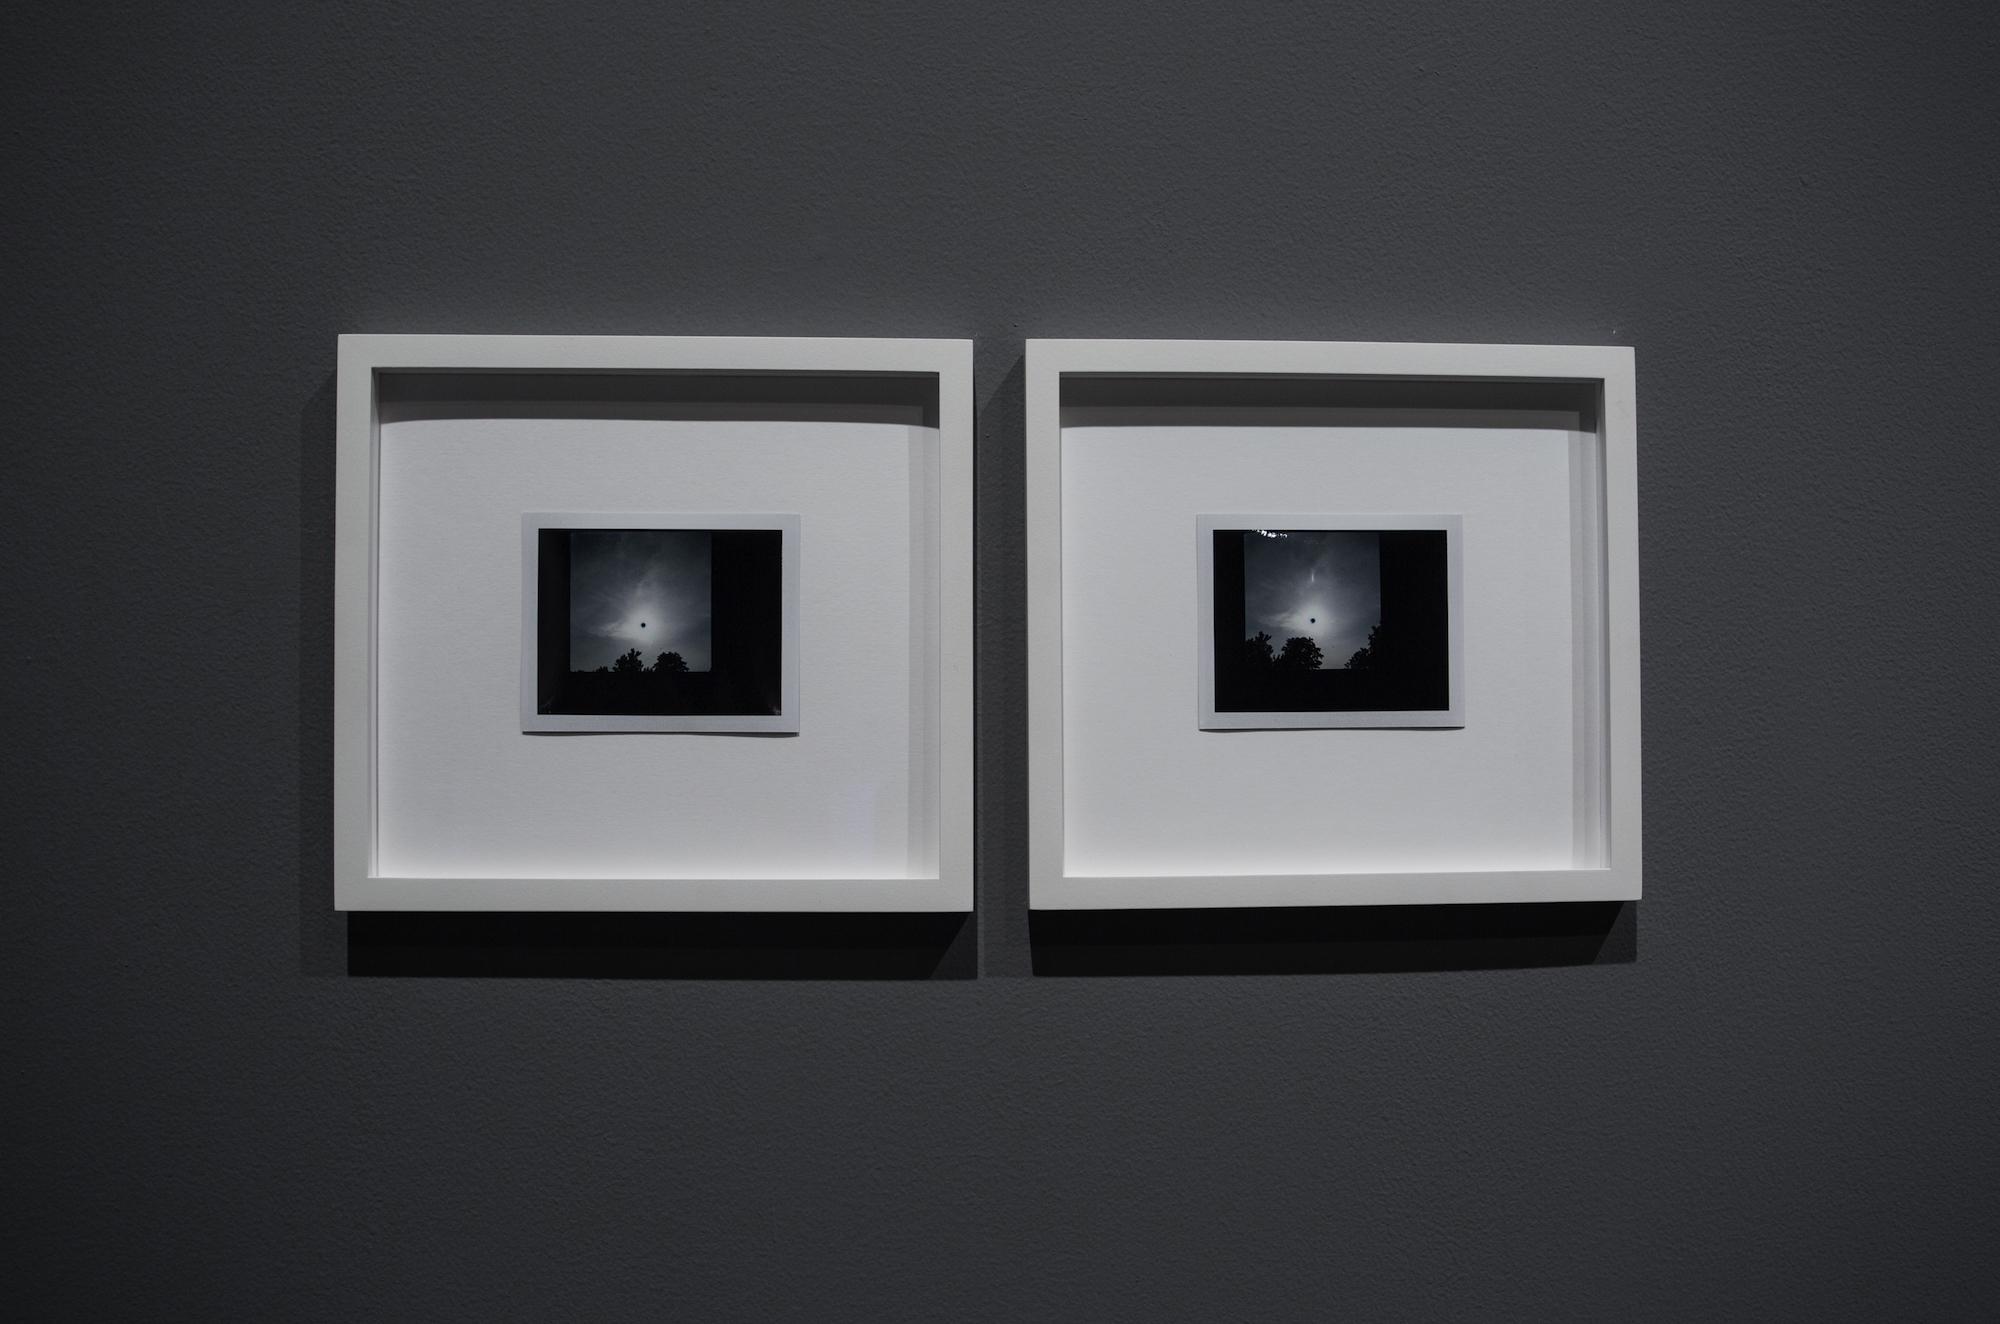 LEFT - RIGHT:  LEFT: Michael John Whelan, Transit of Venus (1), 2012, framed polaroid, 22 x 24 cm  //  RIGHT:  Michael John Whelan, Transit of Venus (2), 2012, framed polaroid, 22 x 24 cm